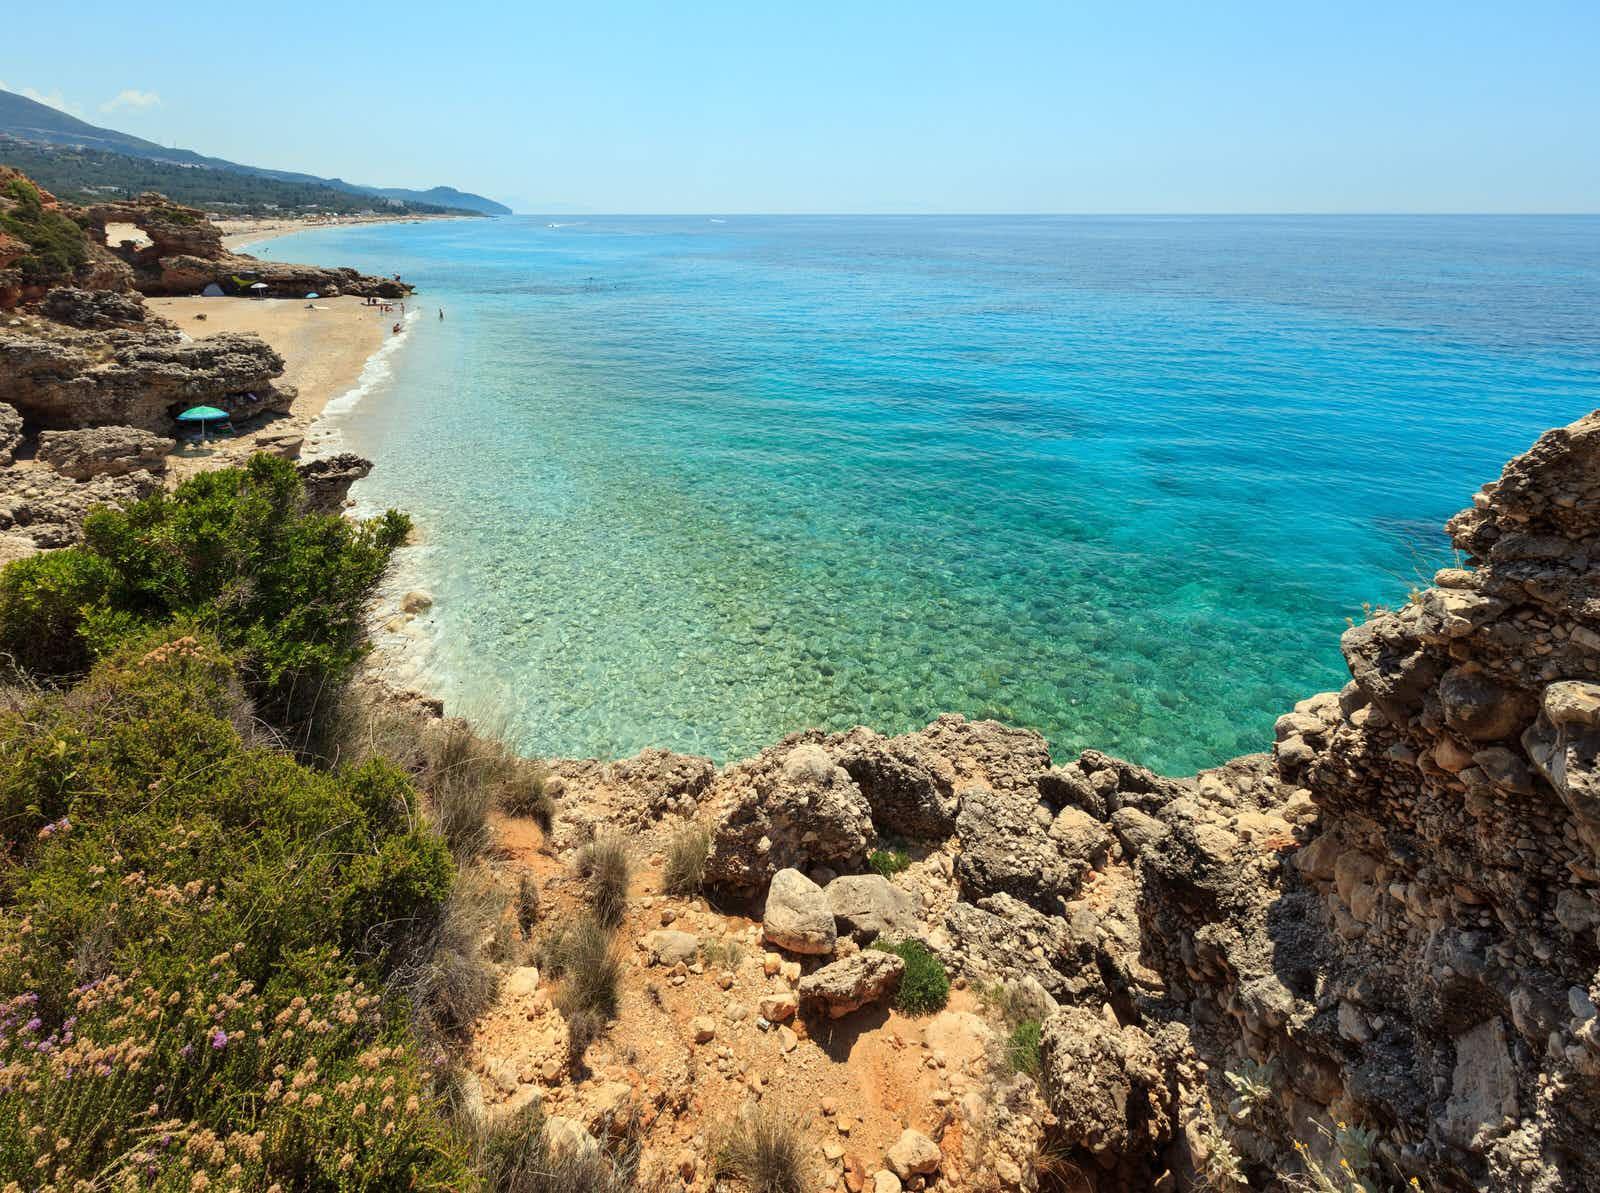 Sandy Drymades beach during summer, on the Ionian Sea, Albania.